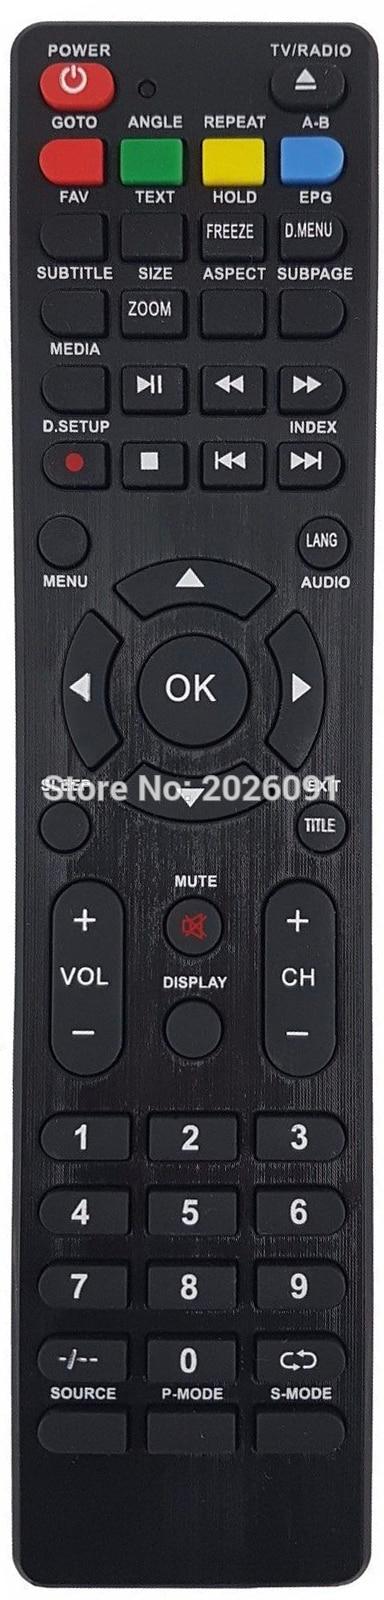 CONTROL remoto para TV TVDB815 TVDB822LED(V2017) TVDB824WH-LED(V2) TVDB832LED-MP02 DSMLED3205FHD HD3200